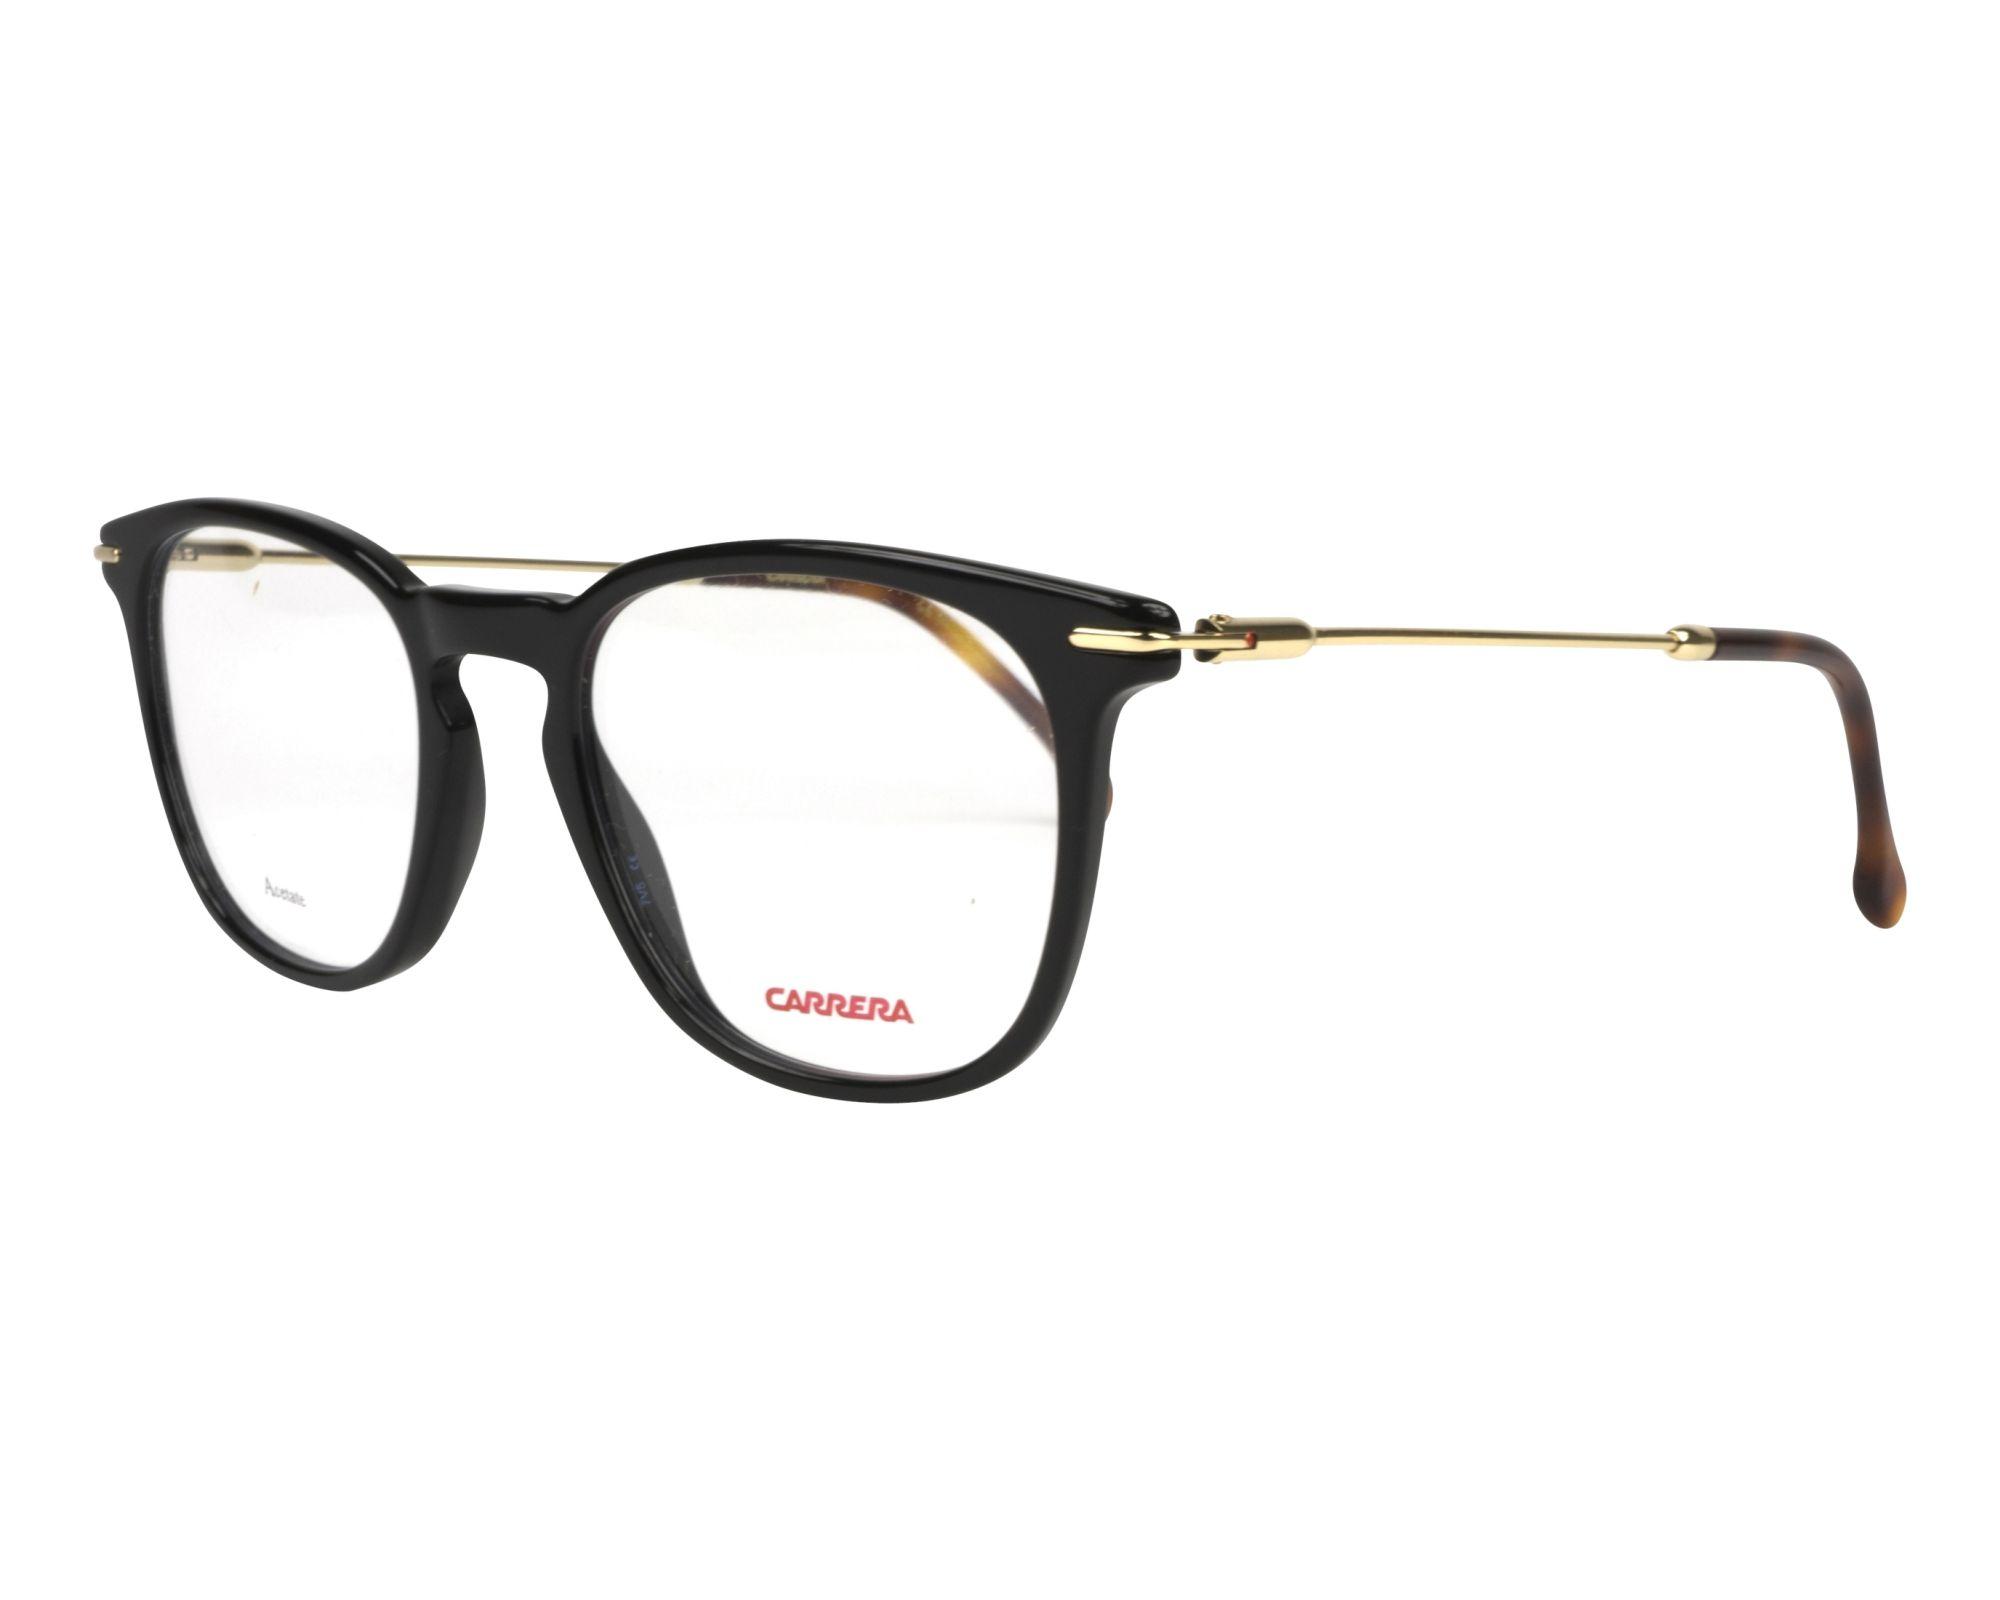 Buy Carrera Eyeglasses 156-V 807 Online - Visionet